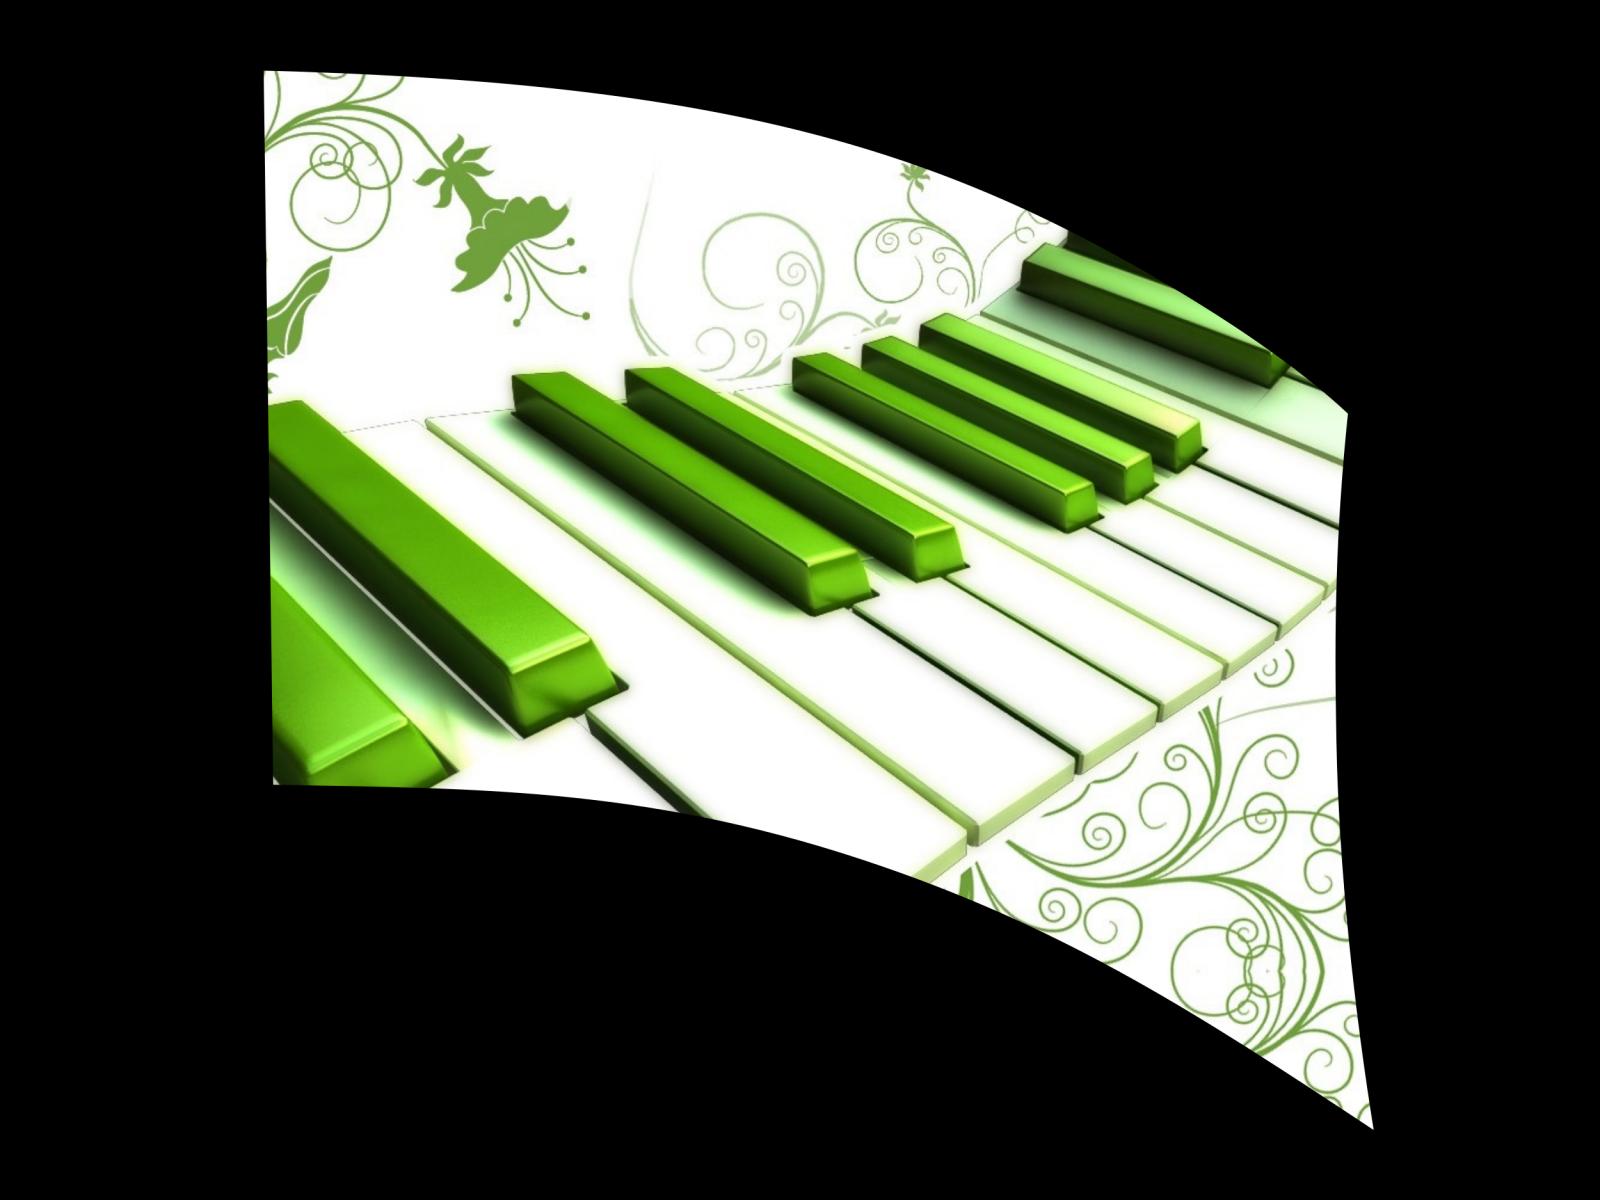 060413s - 36x52 Standard Piano 1